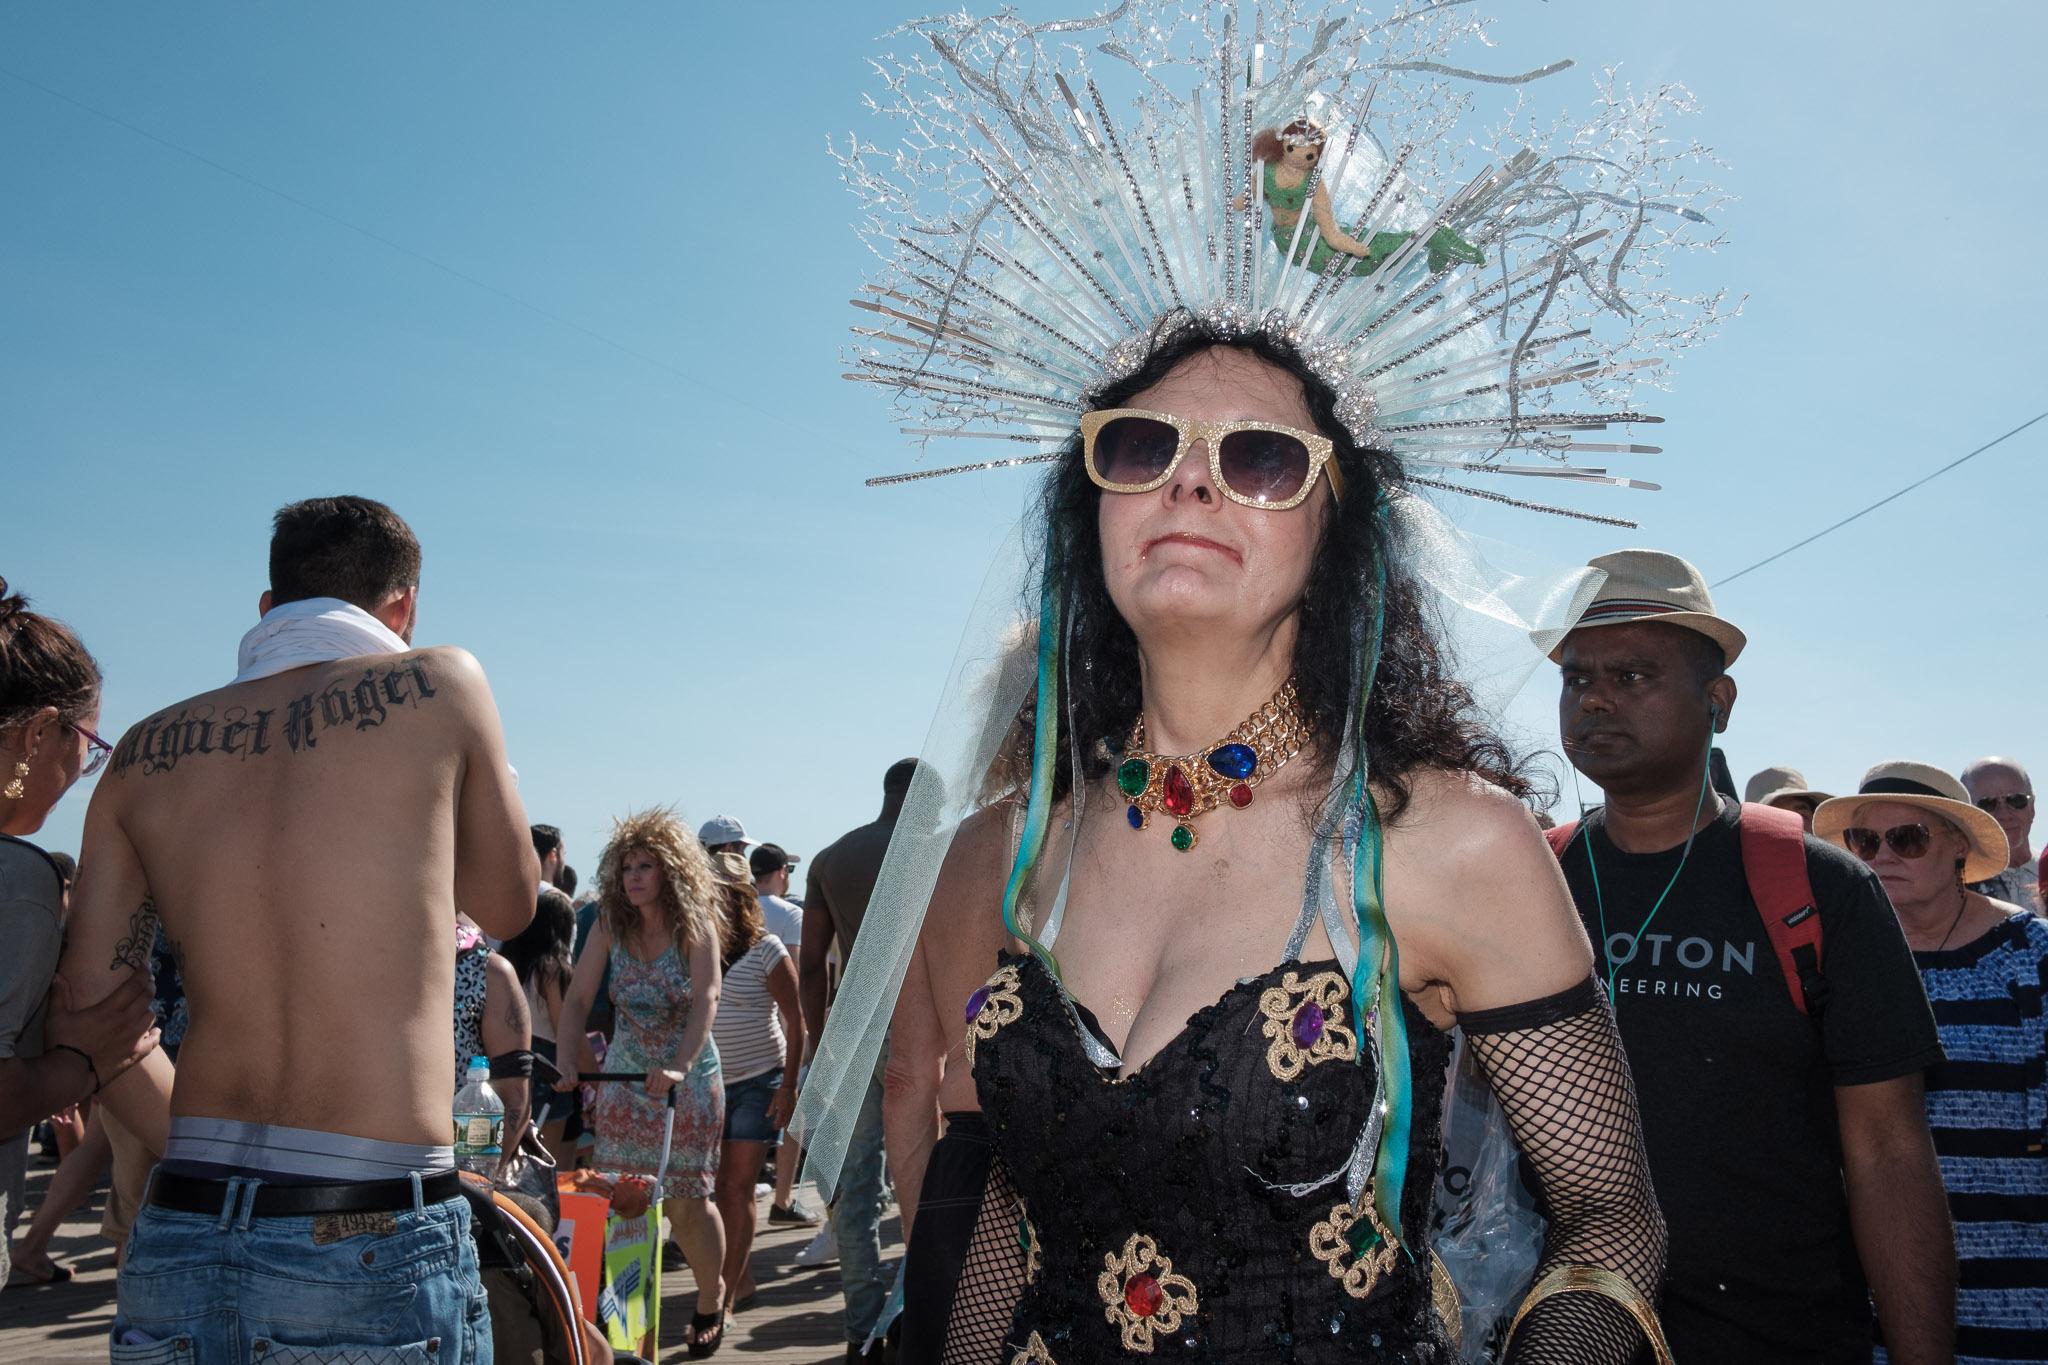 mermaidparade2018_001.jpg